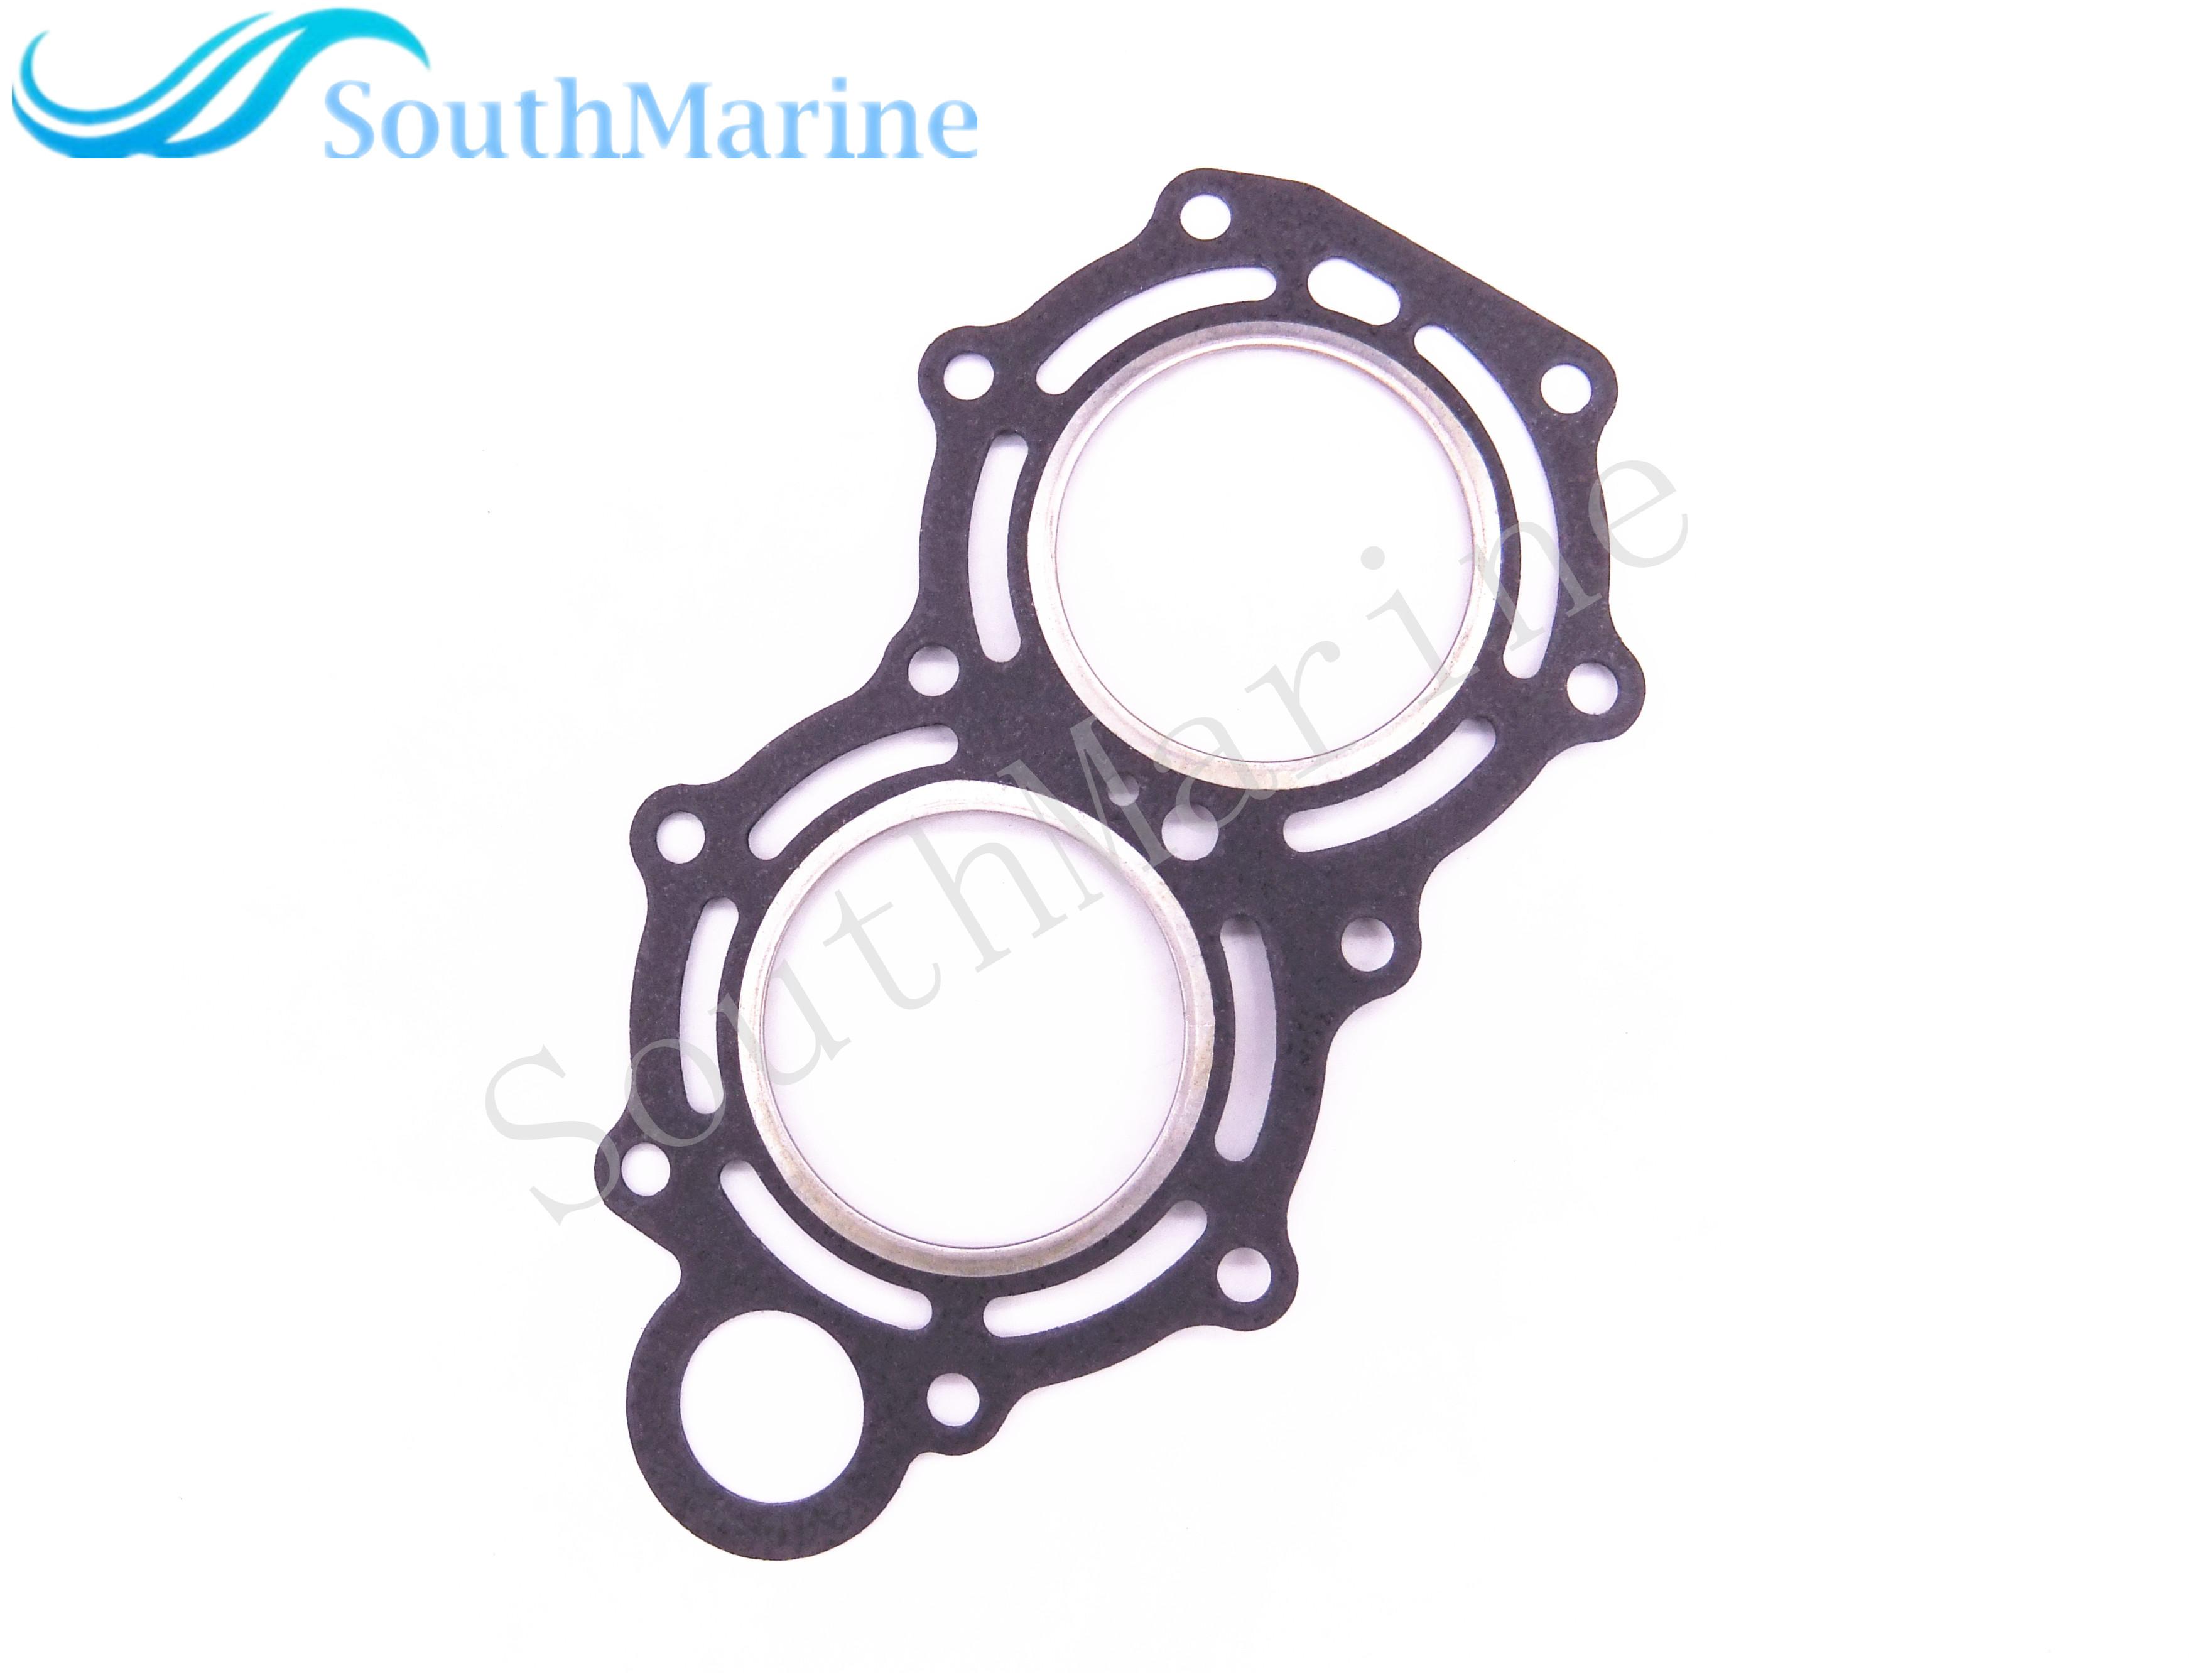 TOHATSU 6HP 6B 8HP 8B 9.8HP M9.8B 2 STROKE POWERHEAD GASKET 3B2-01005-0